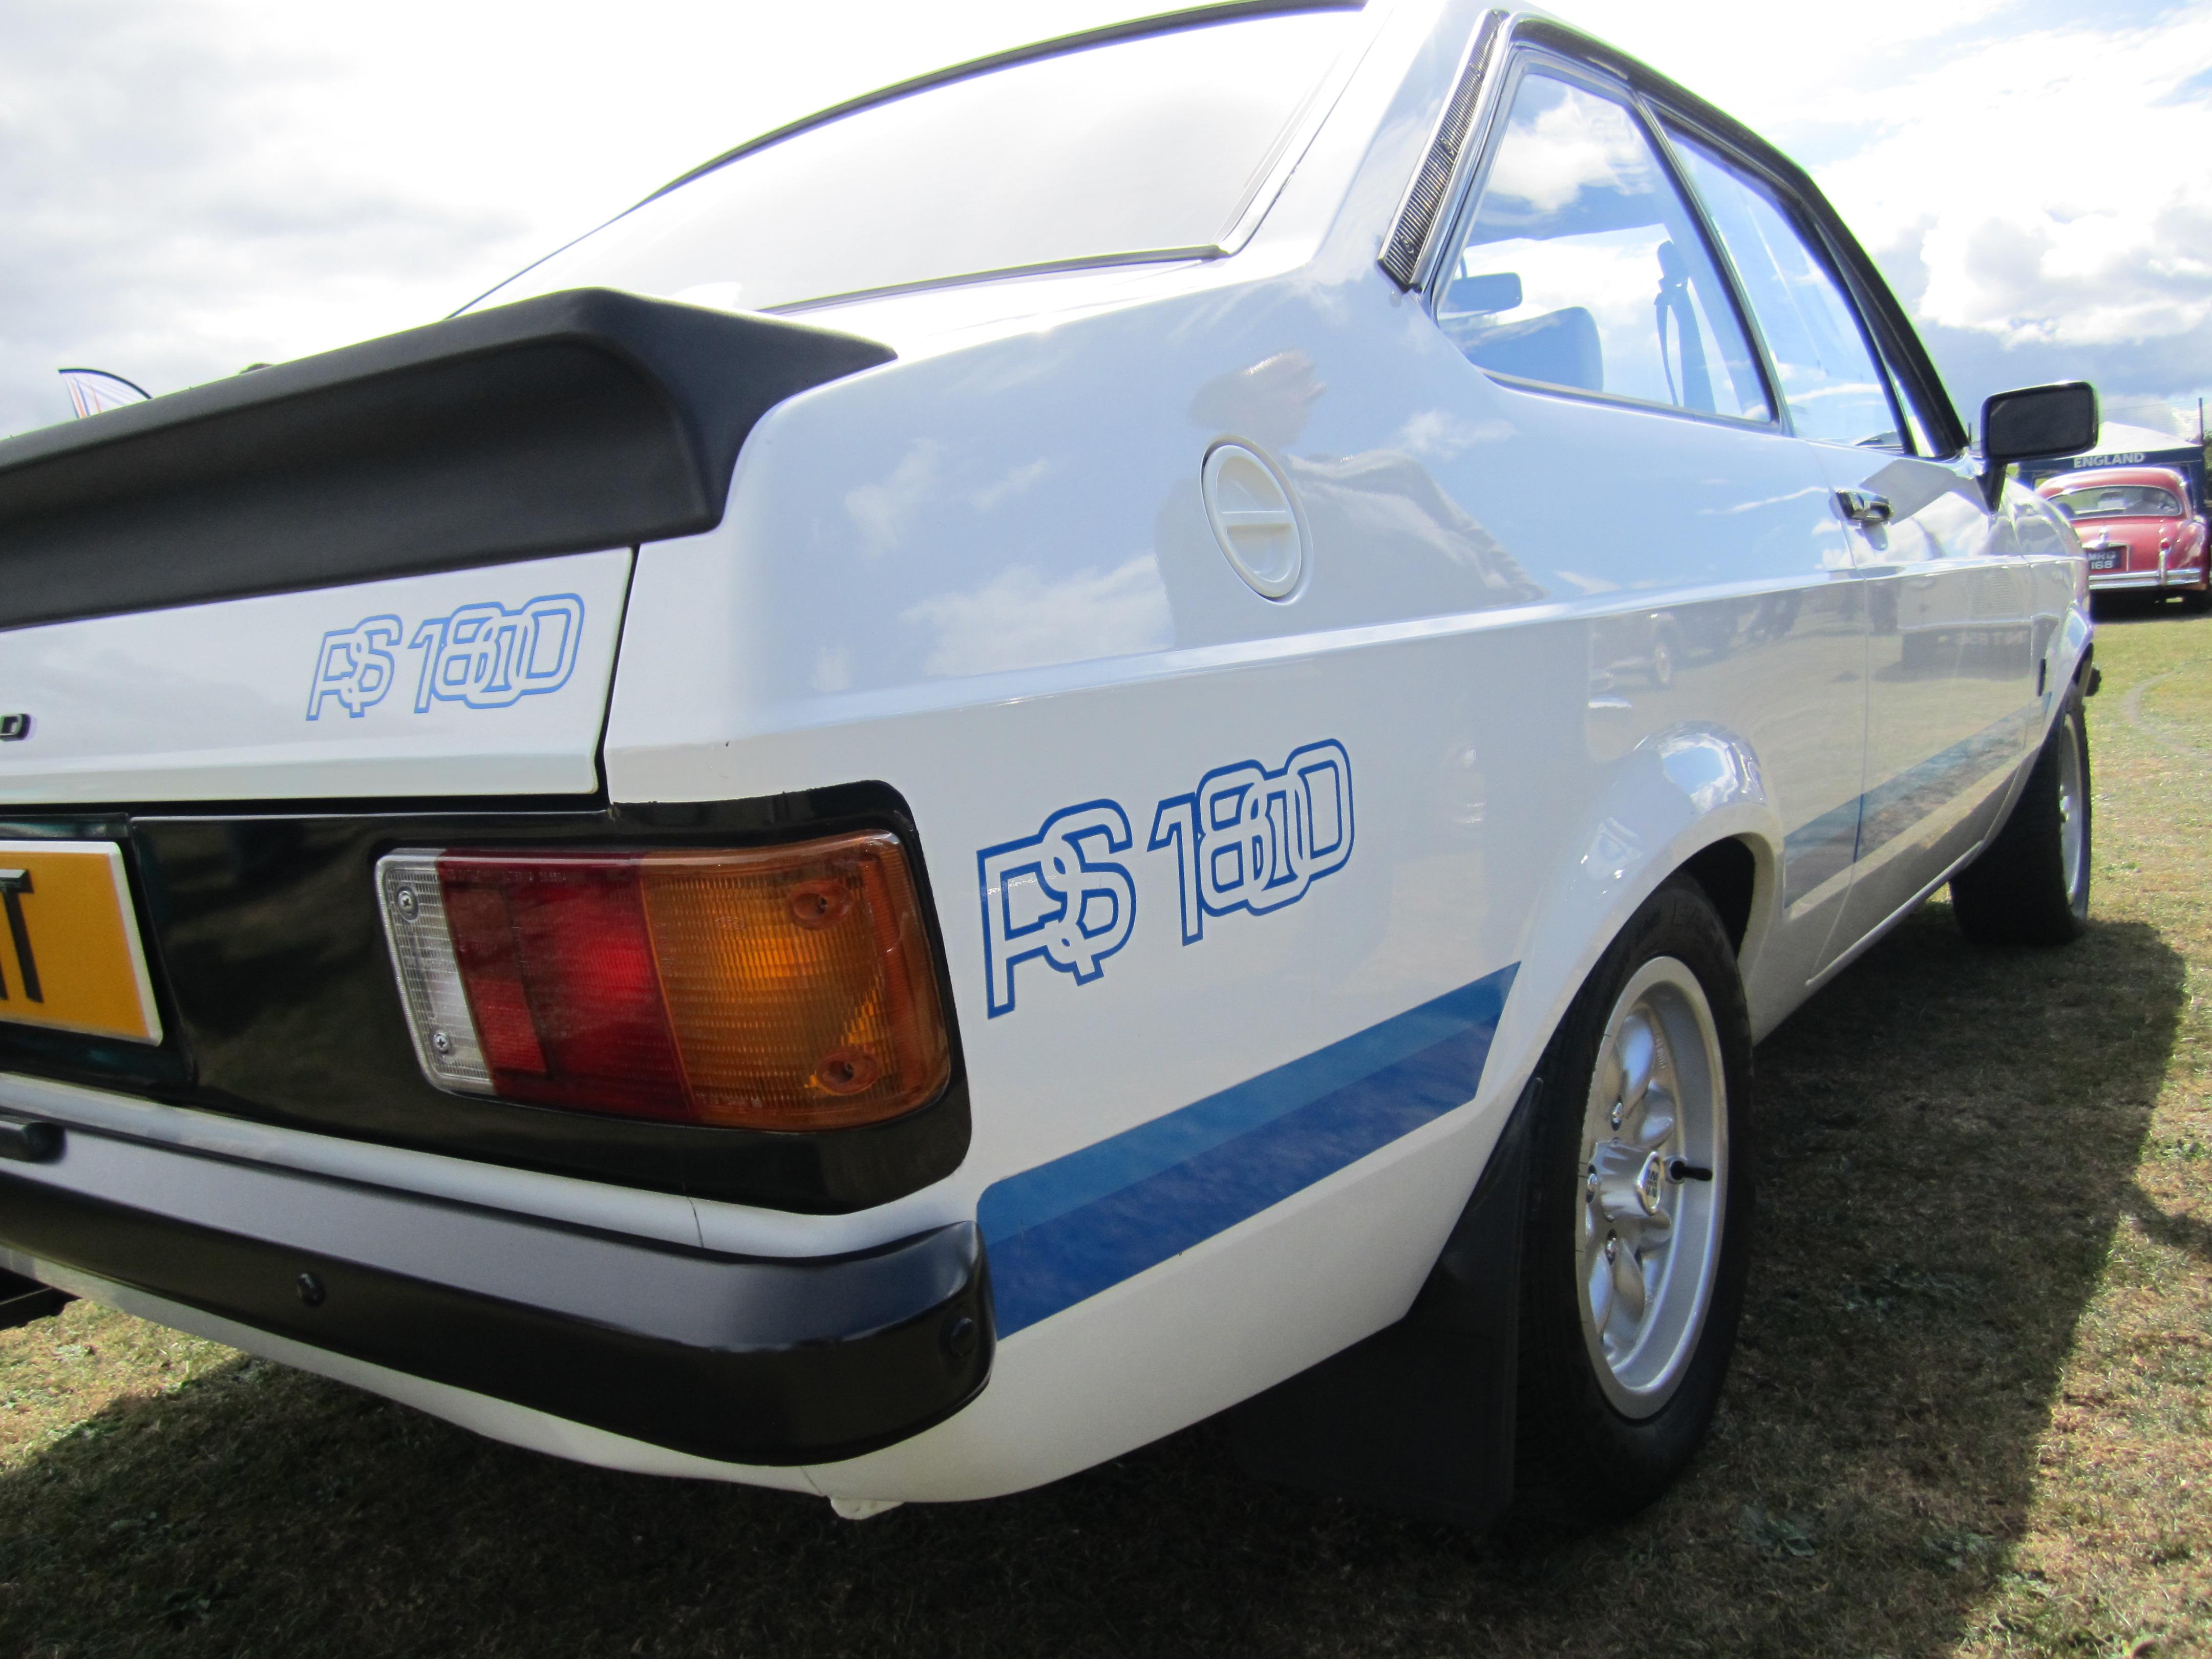 Escort RS1800